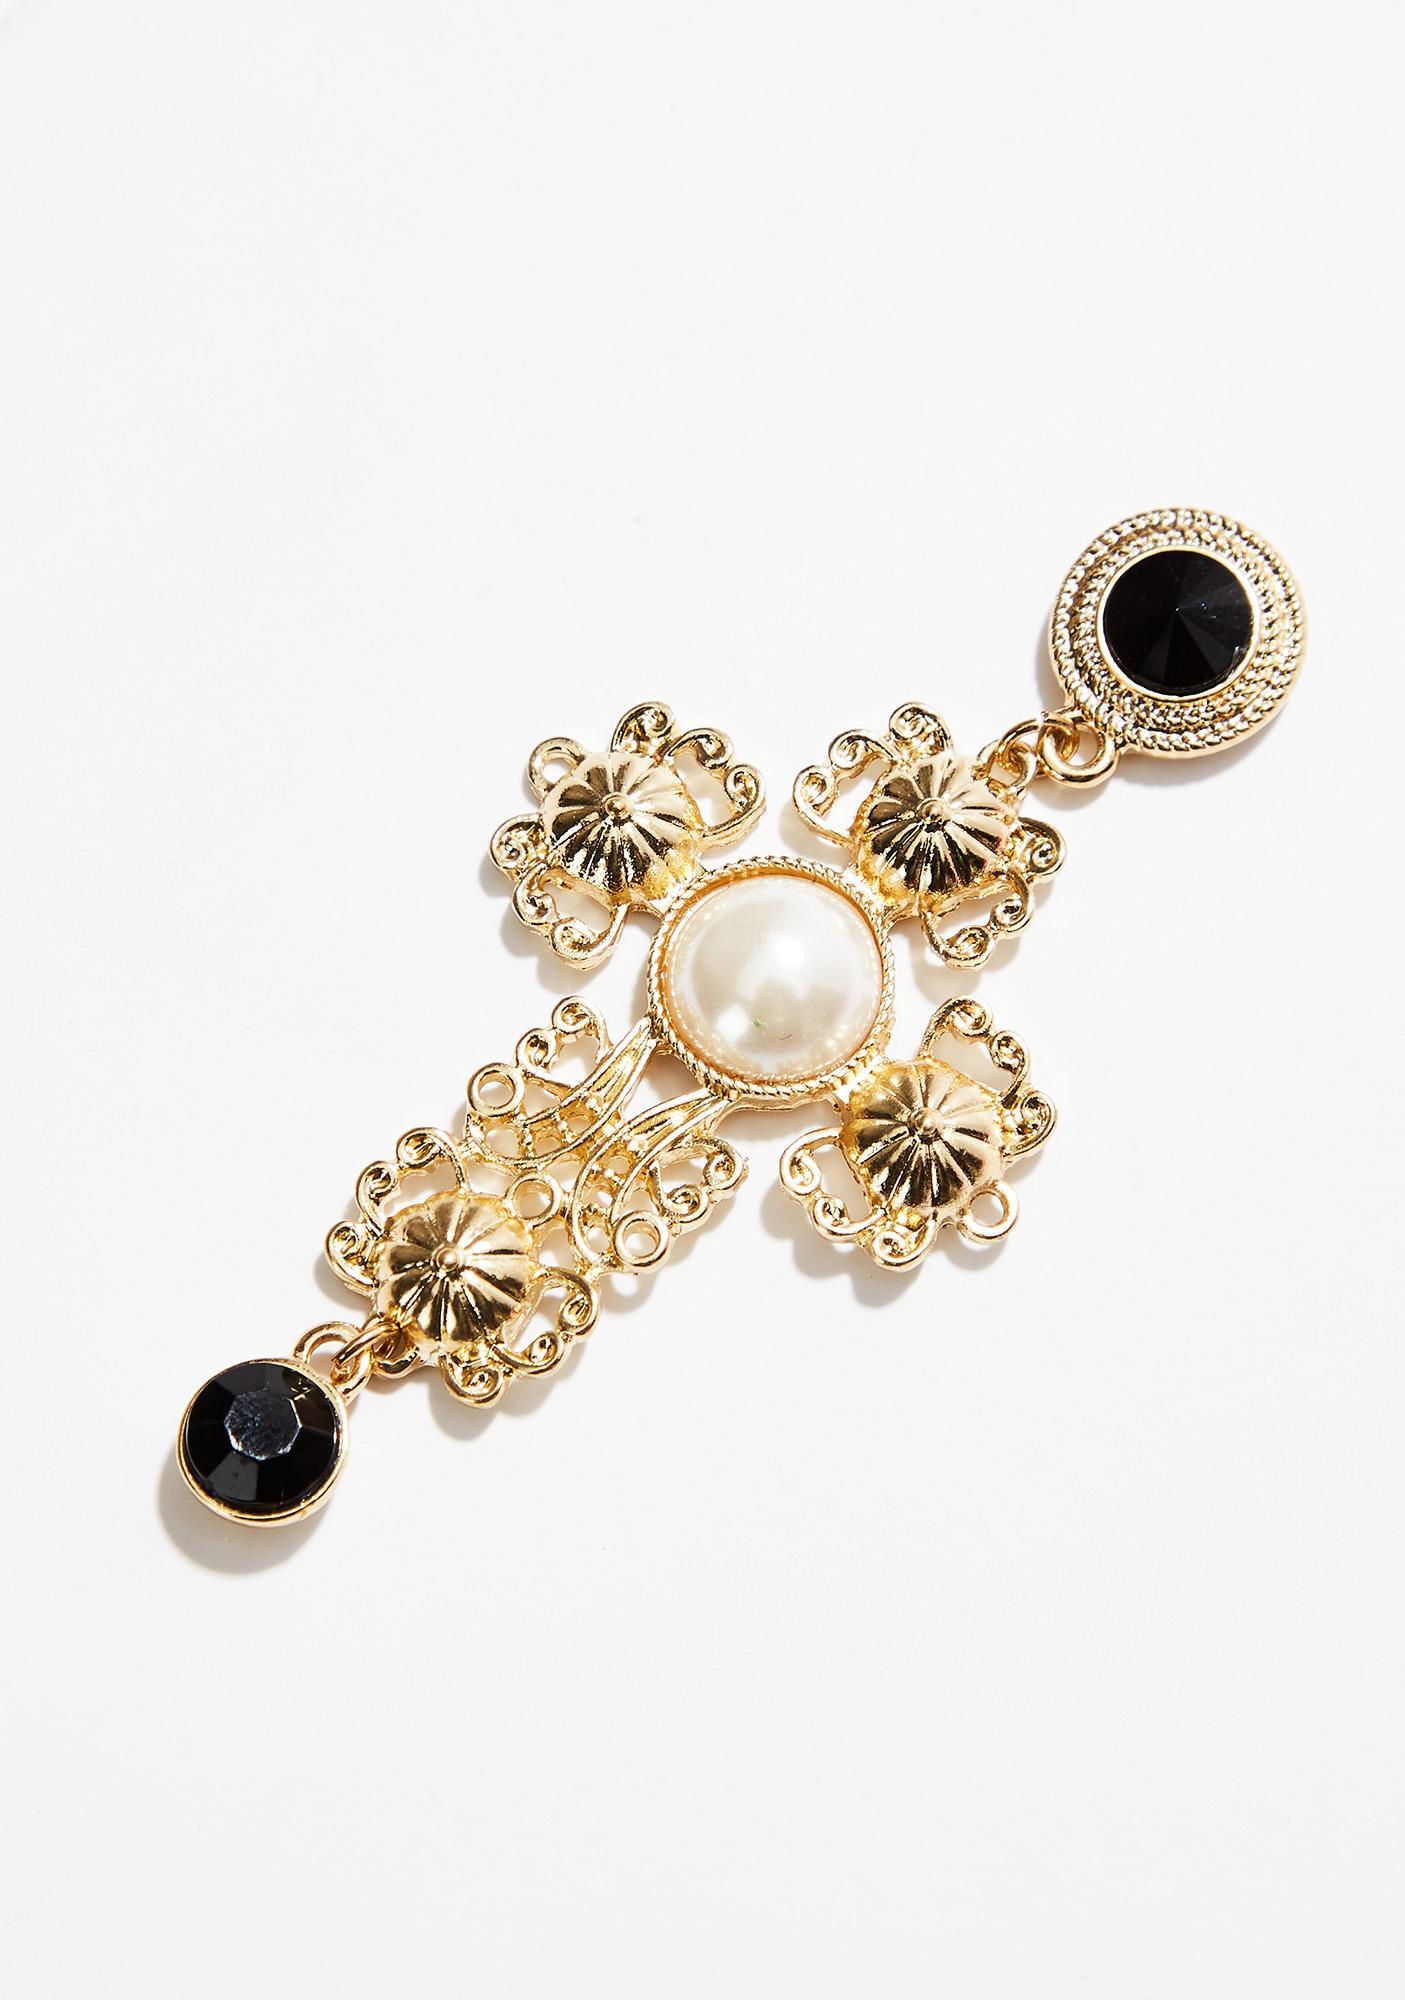 Orly Ornate Earrings